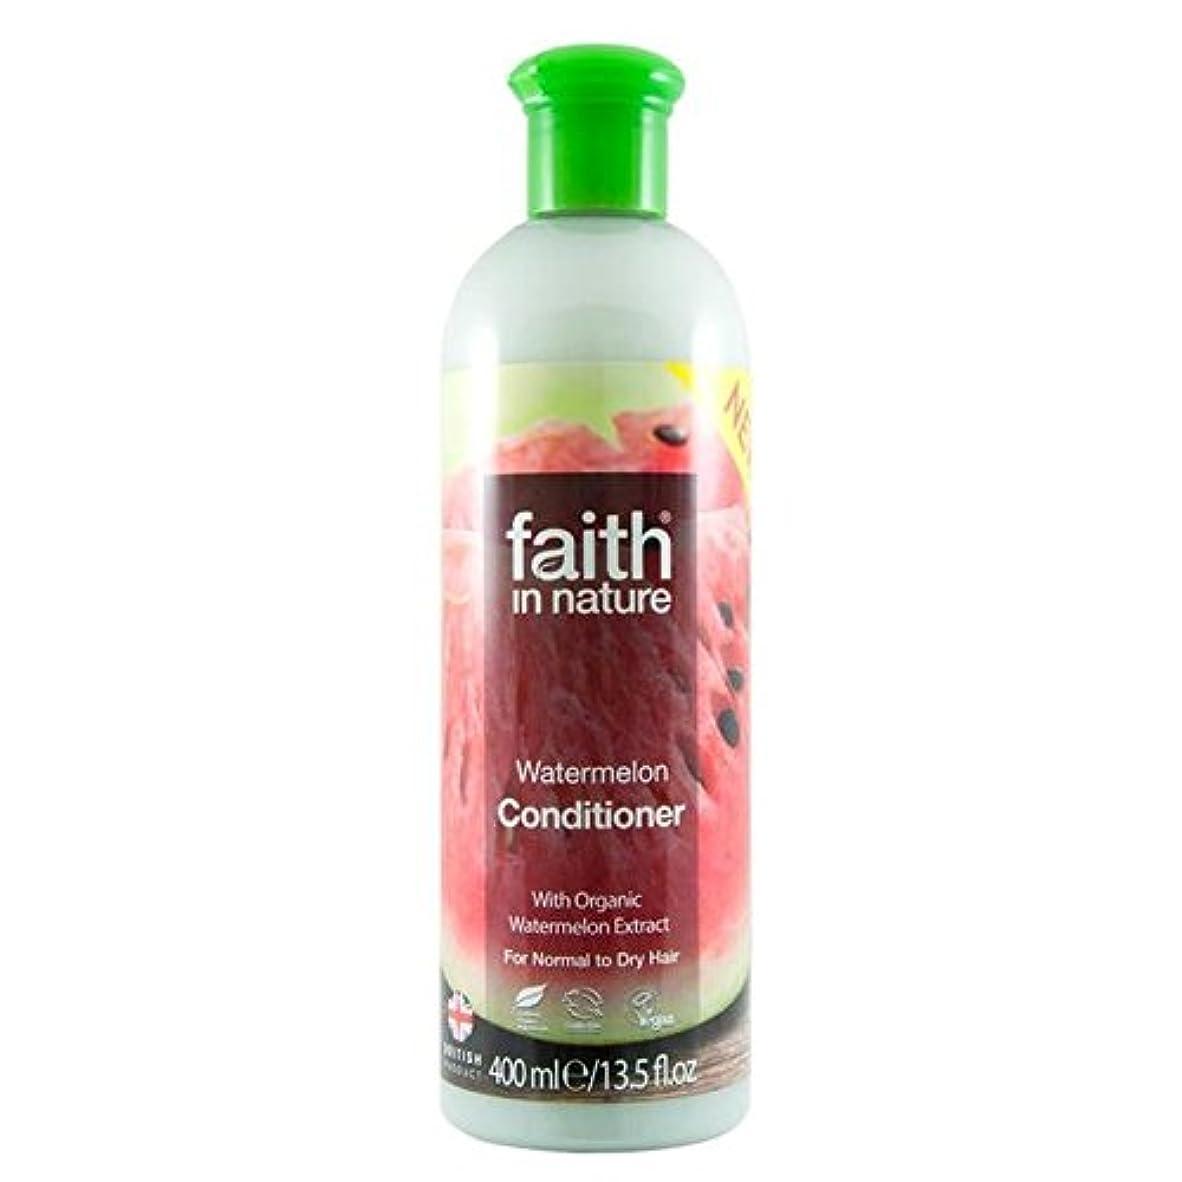 Faith in Nature Watermelon Conditioner 400ml - (Faith In Nature) 自然スイカコンディショナー400ミリリットルの信仰 [並行輸入品]